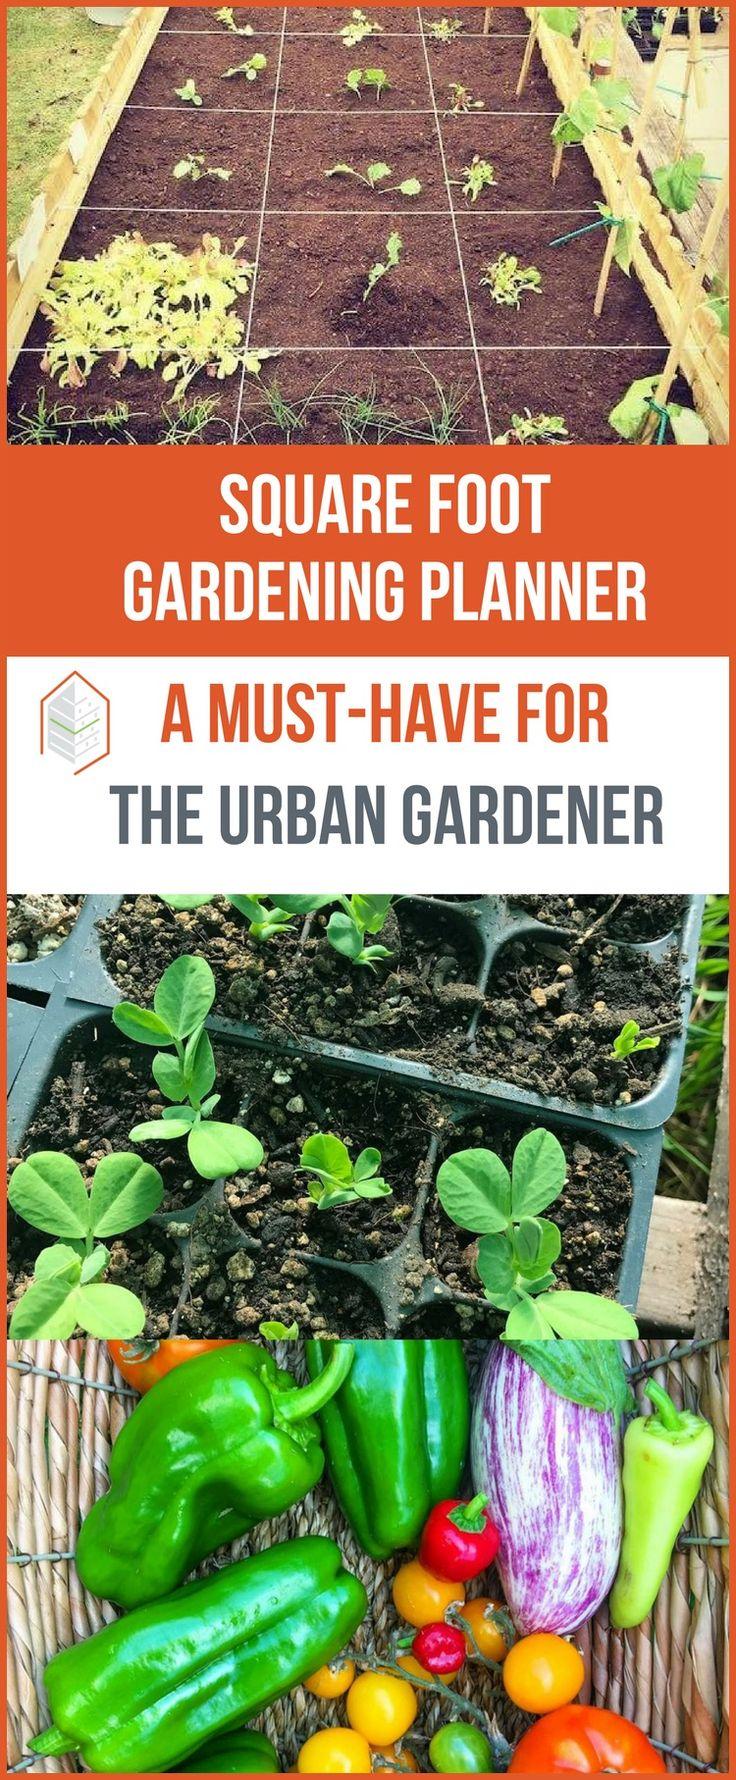 Looking for a square foot gardening planner? Square Foot Gardening is a garden planning method developed by Mel Bartholomew. Learn how does it work here! #urbangardening #urbanfarming #gardening #diy #garden #ugrpost